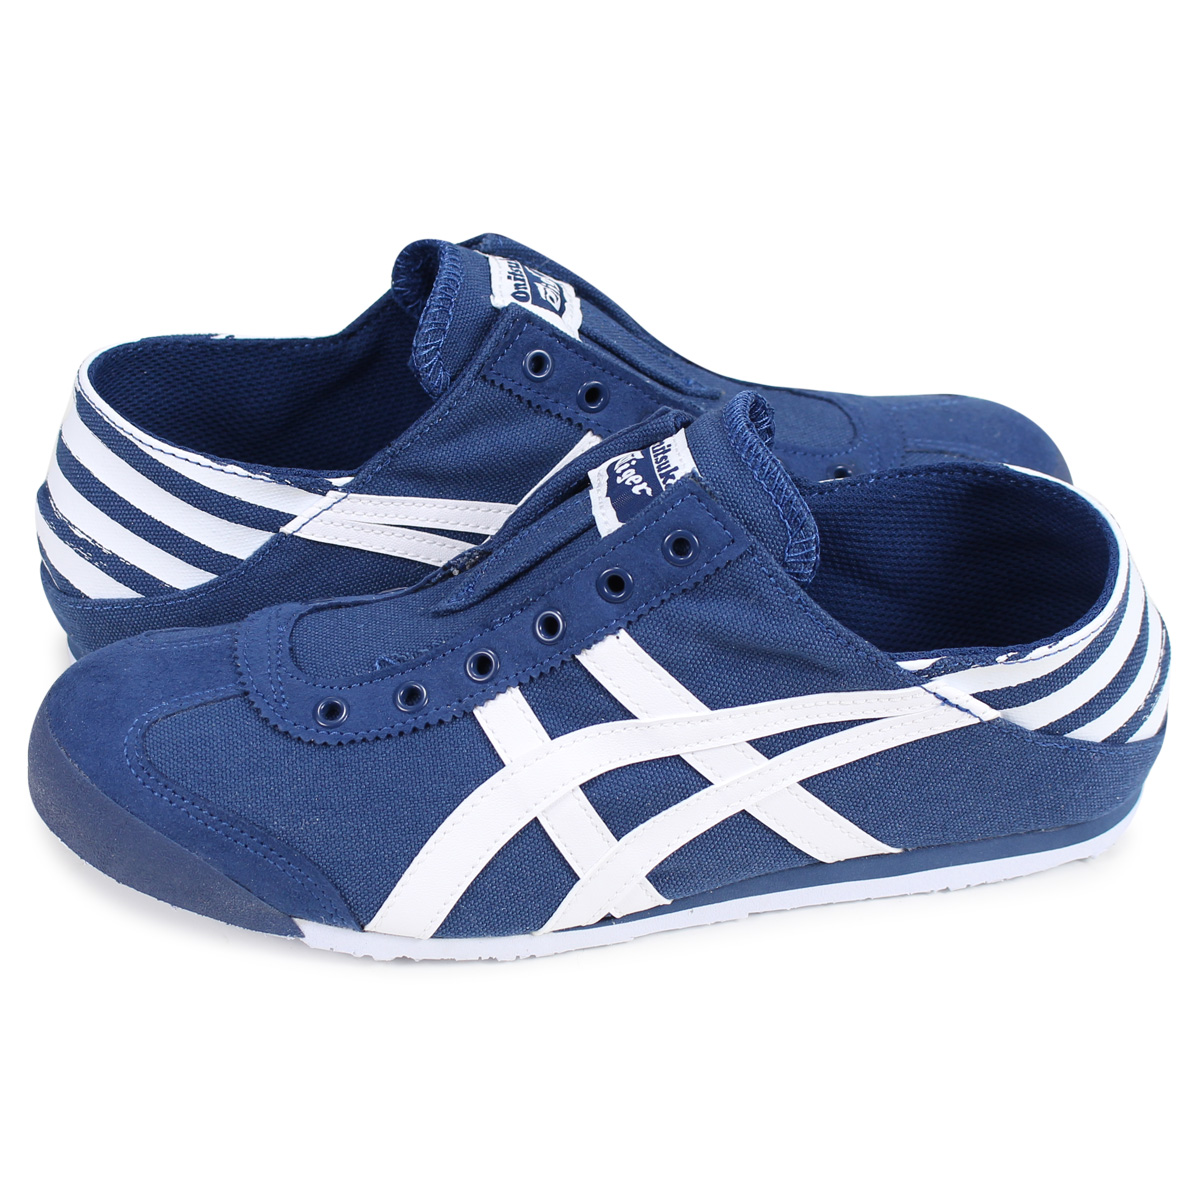 buy popular 572dd 552fb Onitsuka Tiger MEXICO 66 PARATY Onitsuka tiger Mexico 66 sneakers slip-ons  men gap Dis blue 1183A339-401 [193]